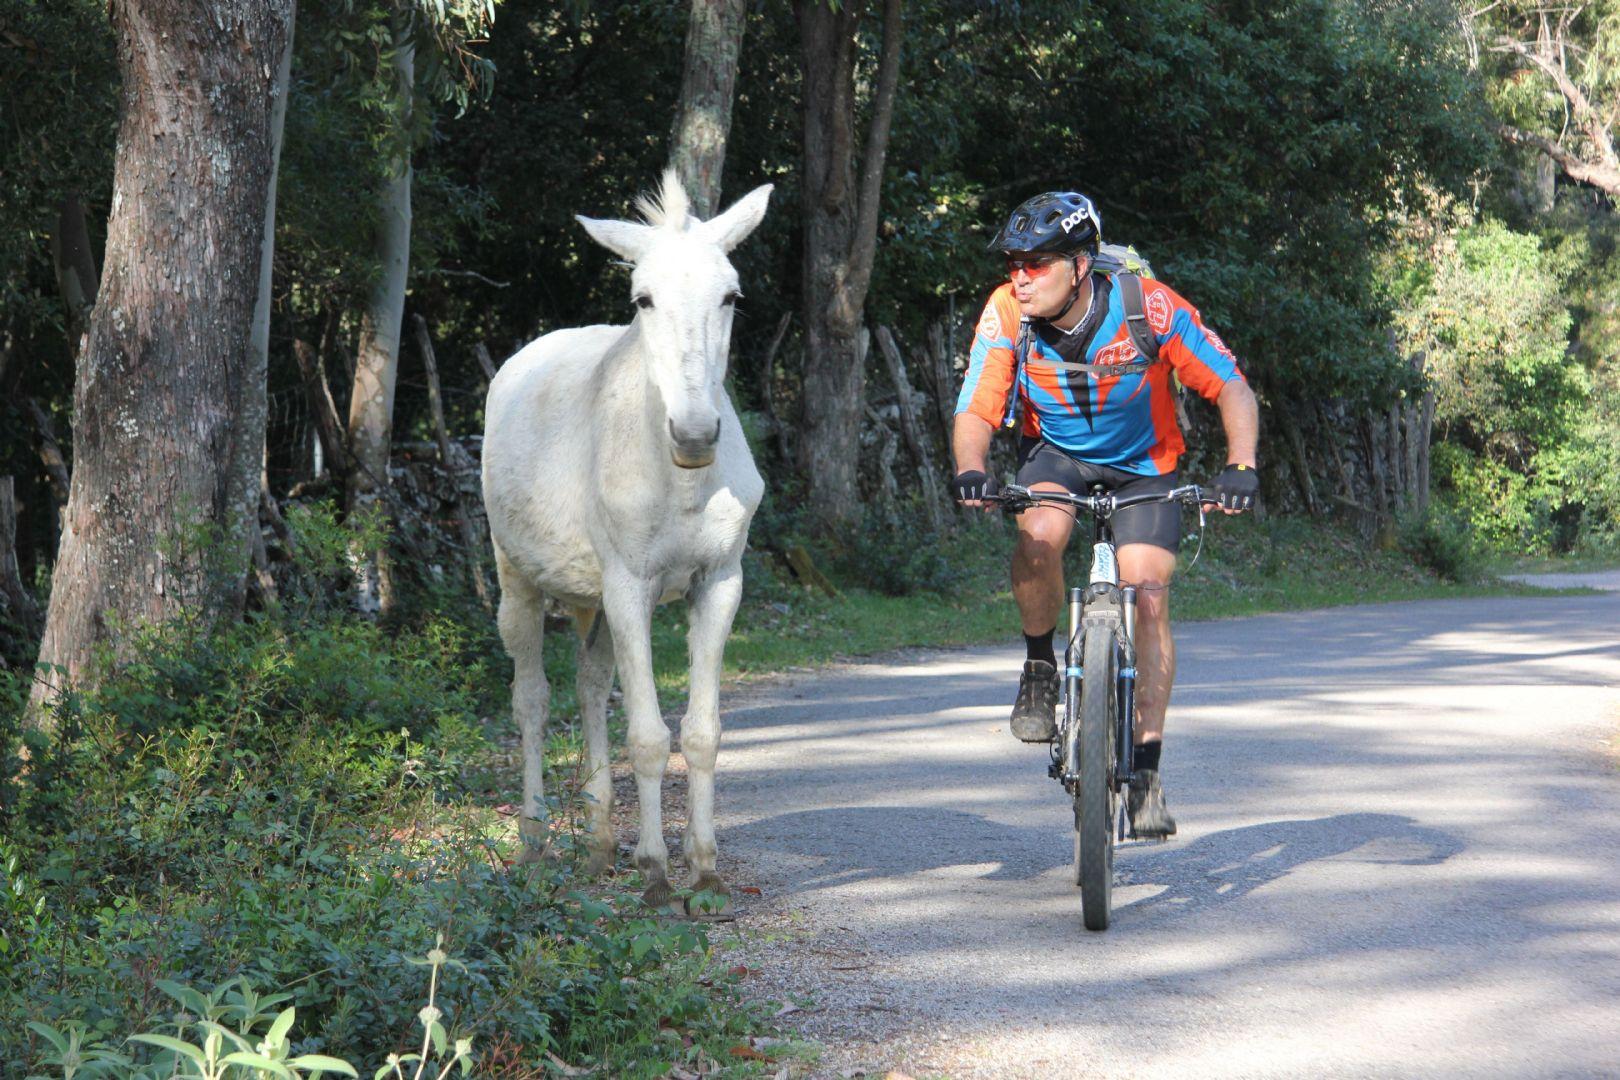 IMG_9208.JPG - Spain - Trans Andaluz - Guided Mountain Bike Holiday - Mountain Biking